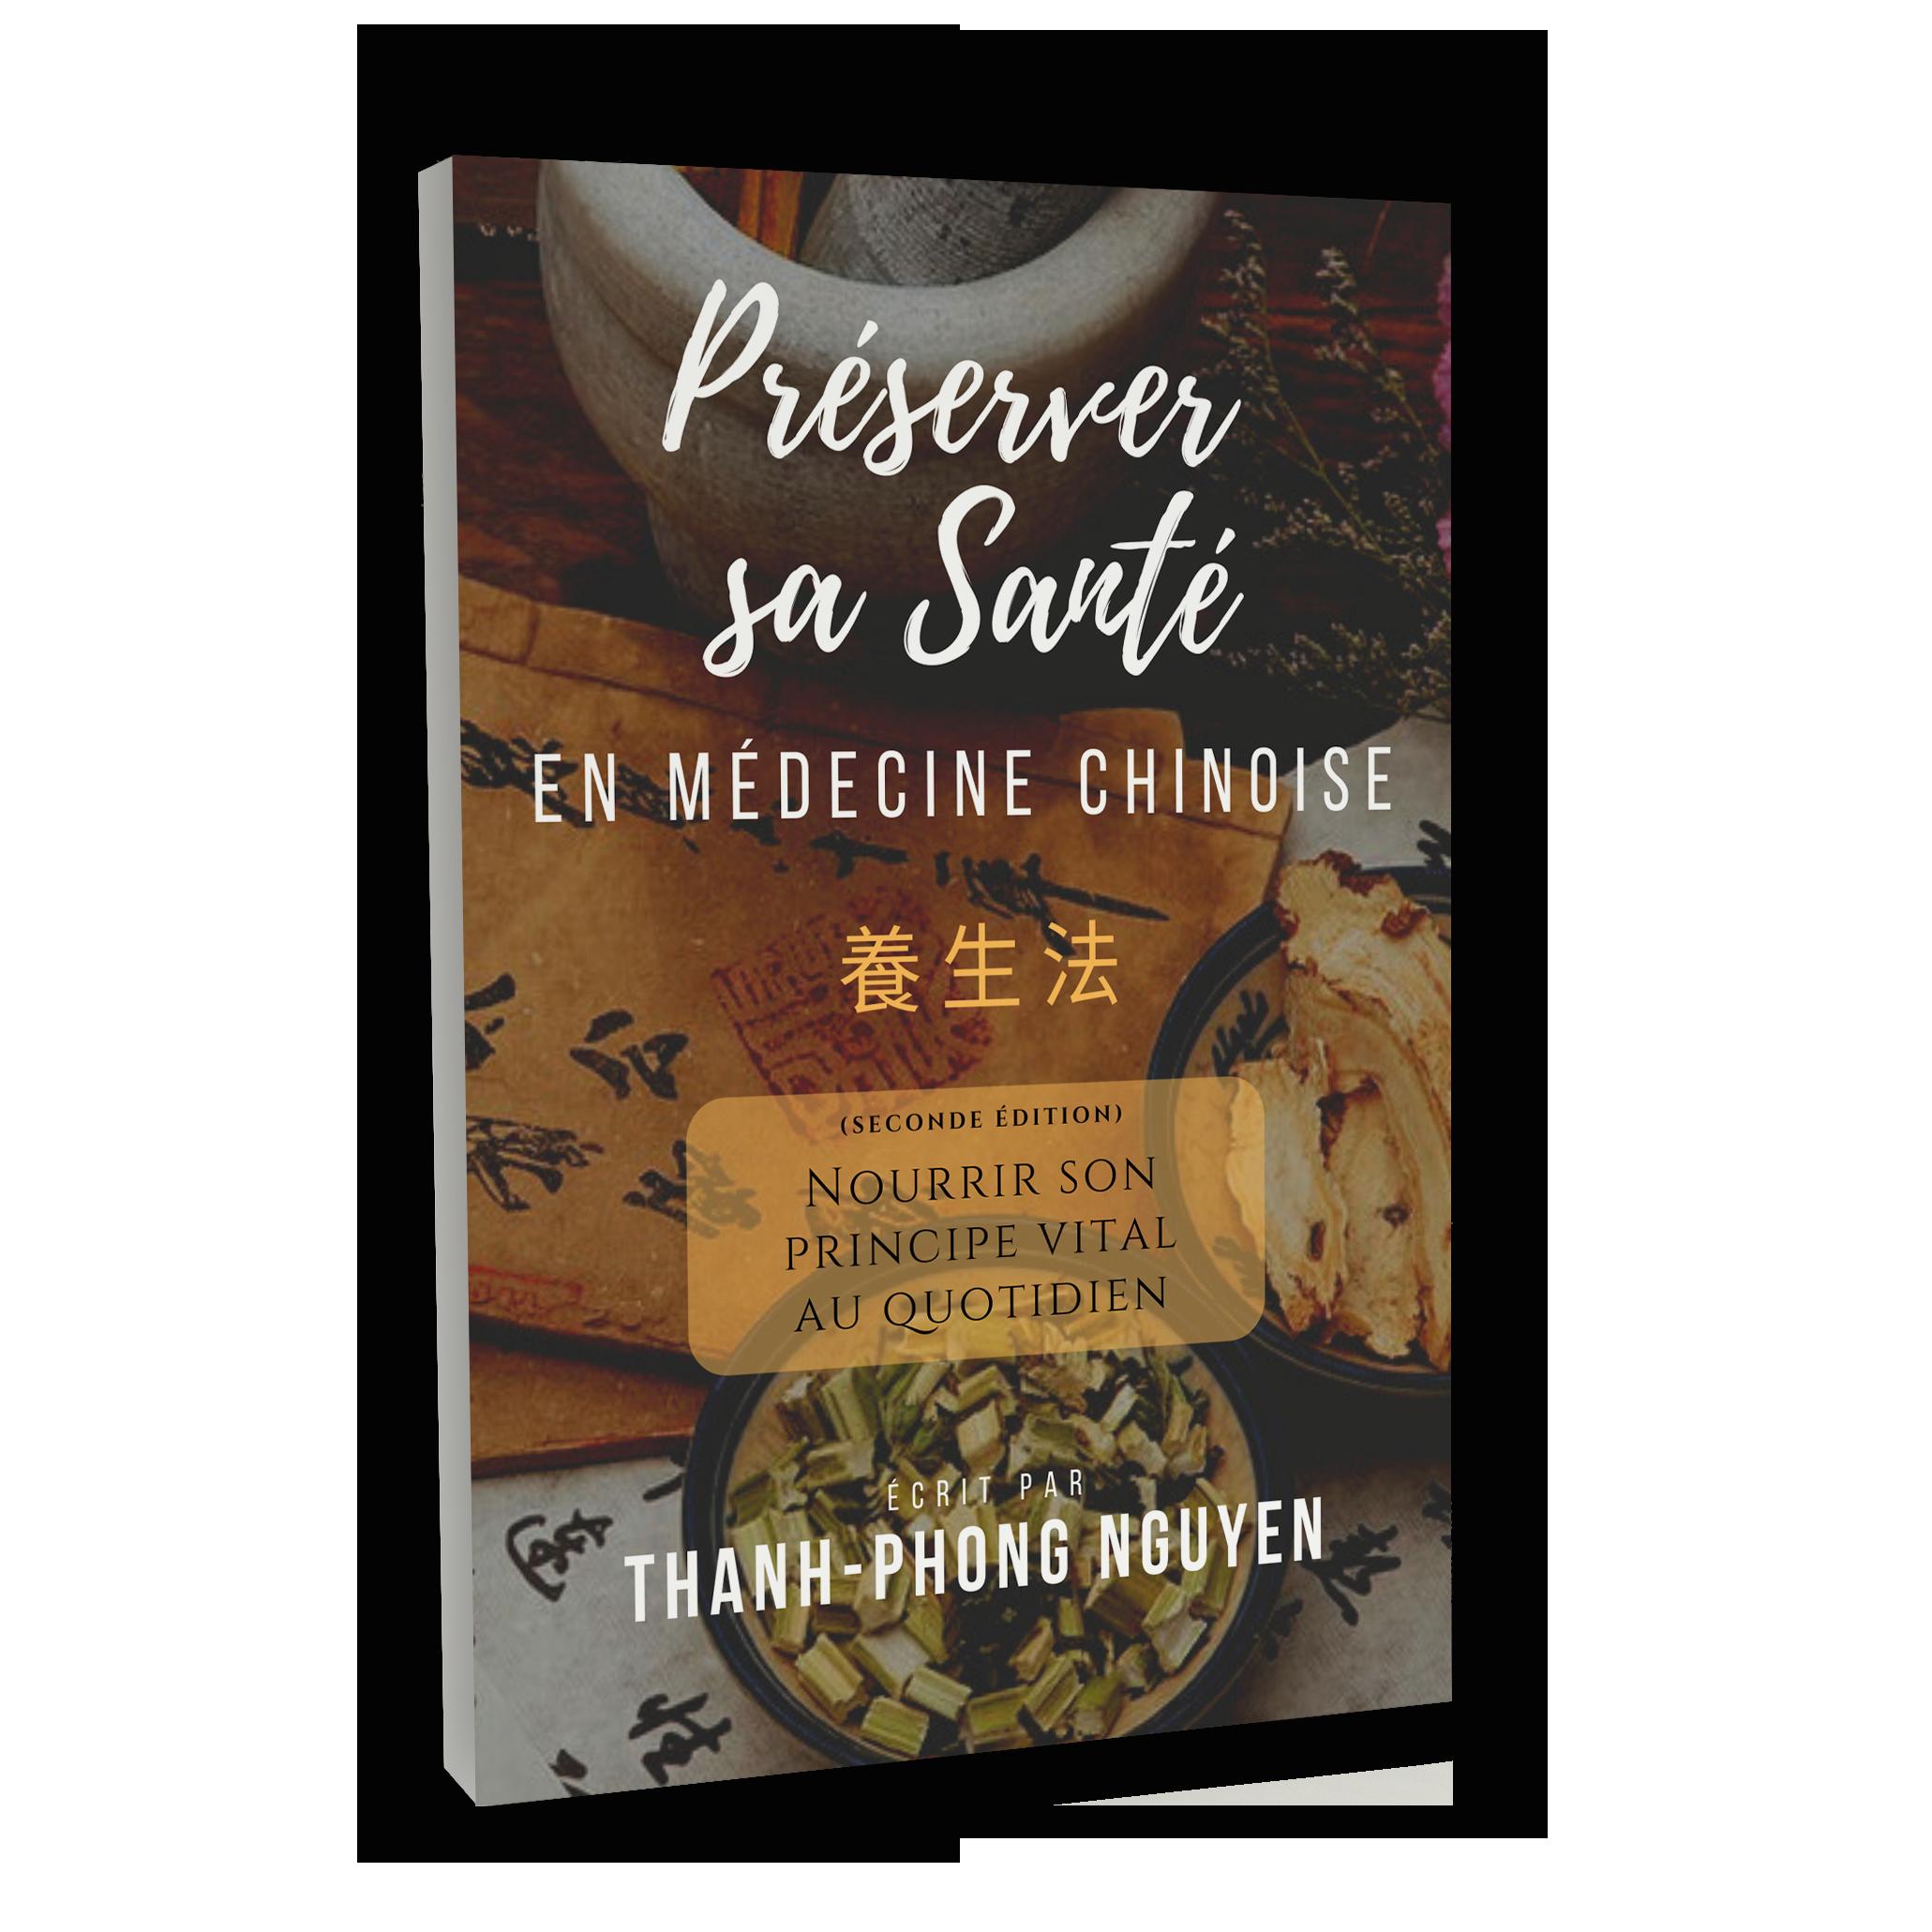 Preserver sa sante en medecine chinoise ebook